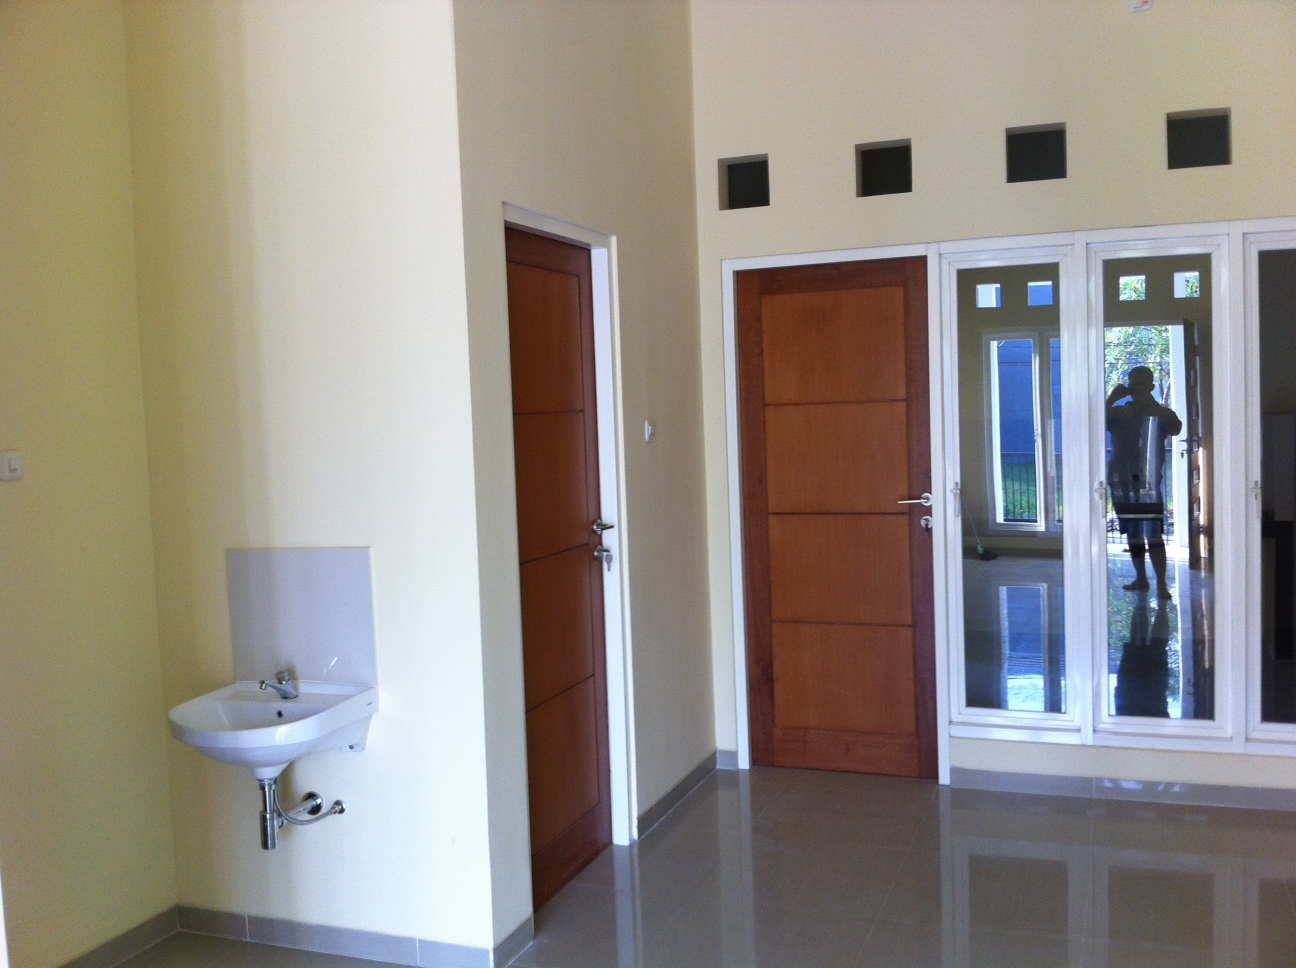 Rumah Bukit Palma Citraland Surabaya E5 0812 32 45145 Wening